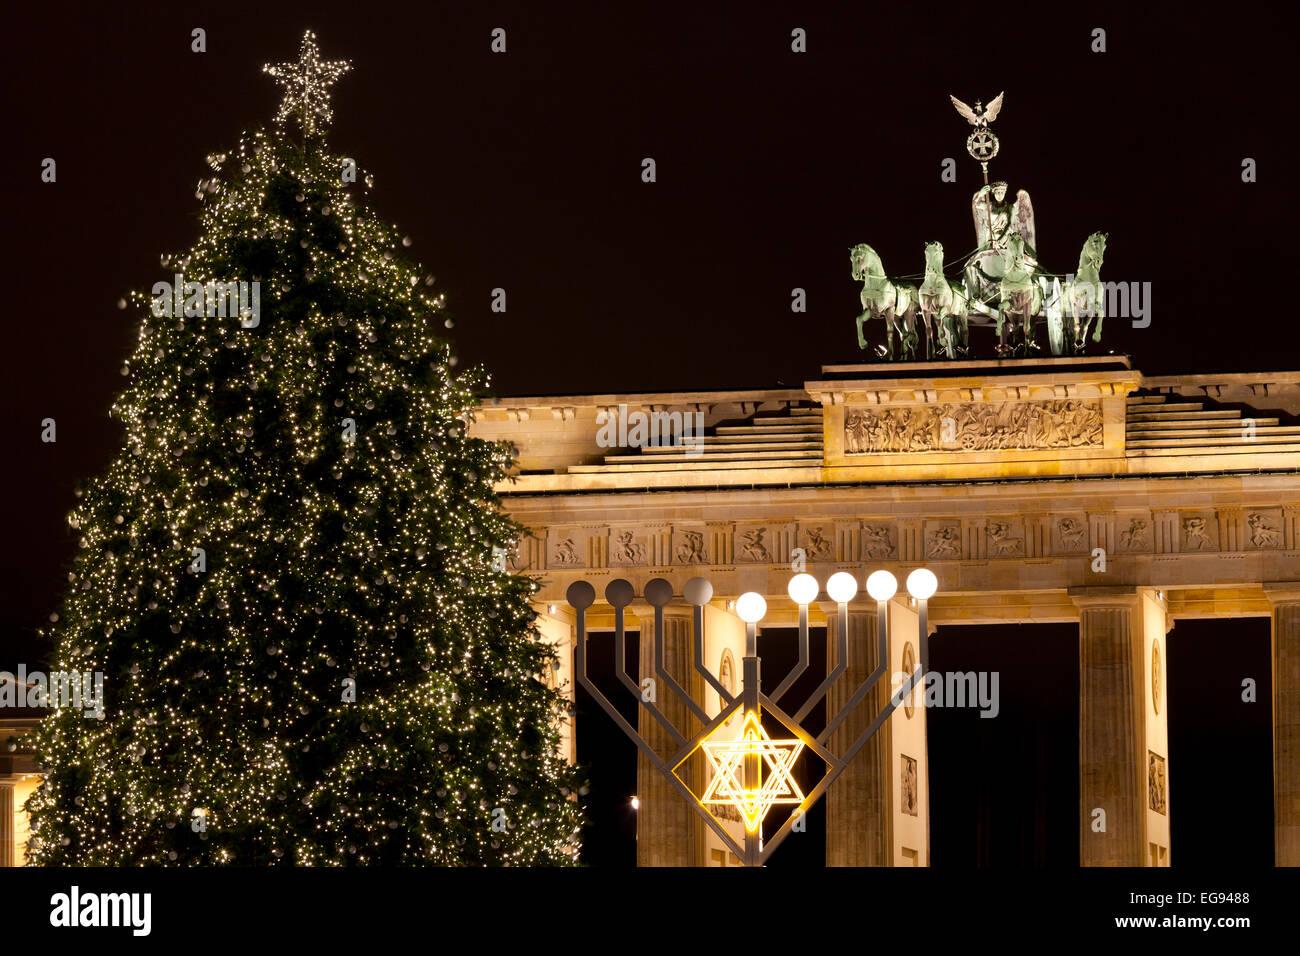 The Brandenburg Gate, Christmas Tree and Menorah, Berlin, Germany